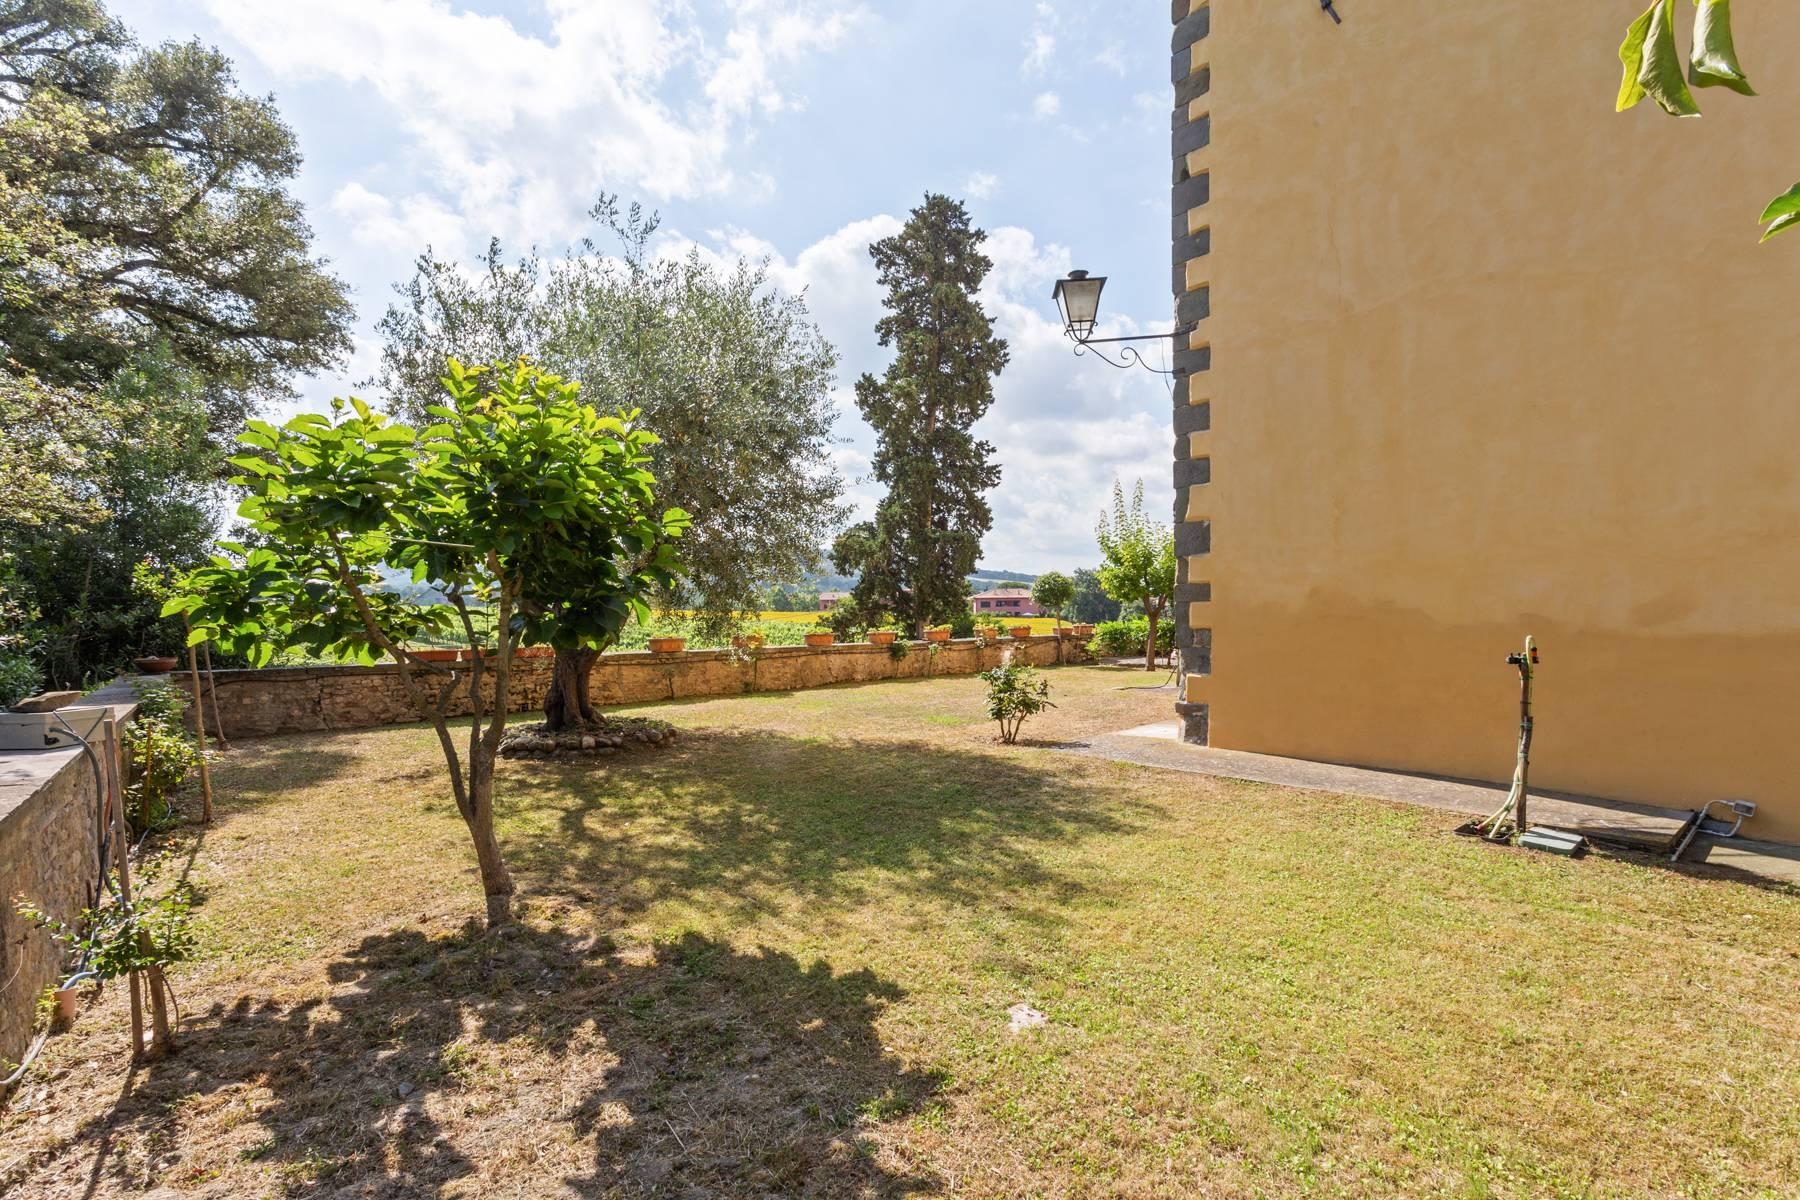 Appartamento in Vendita a Scandicci: 5 locali, 140 mq - Foto 15